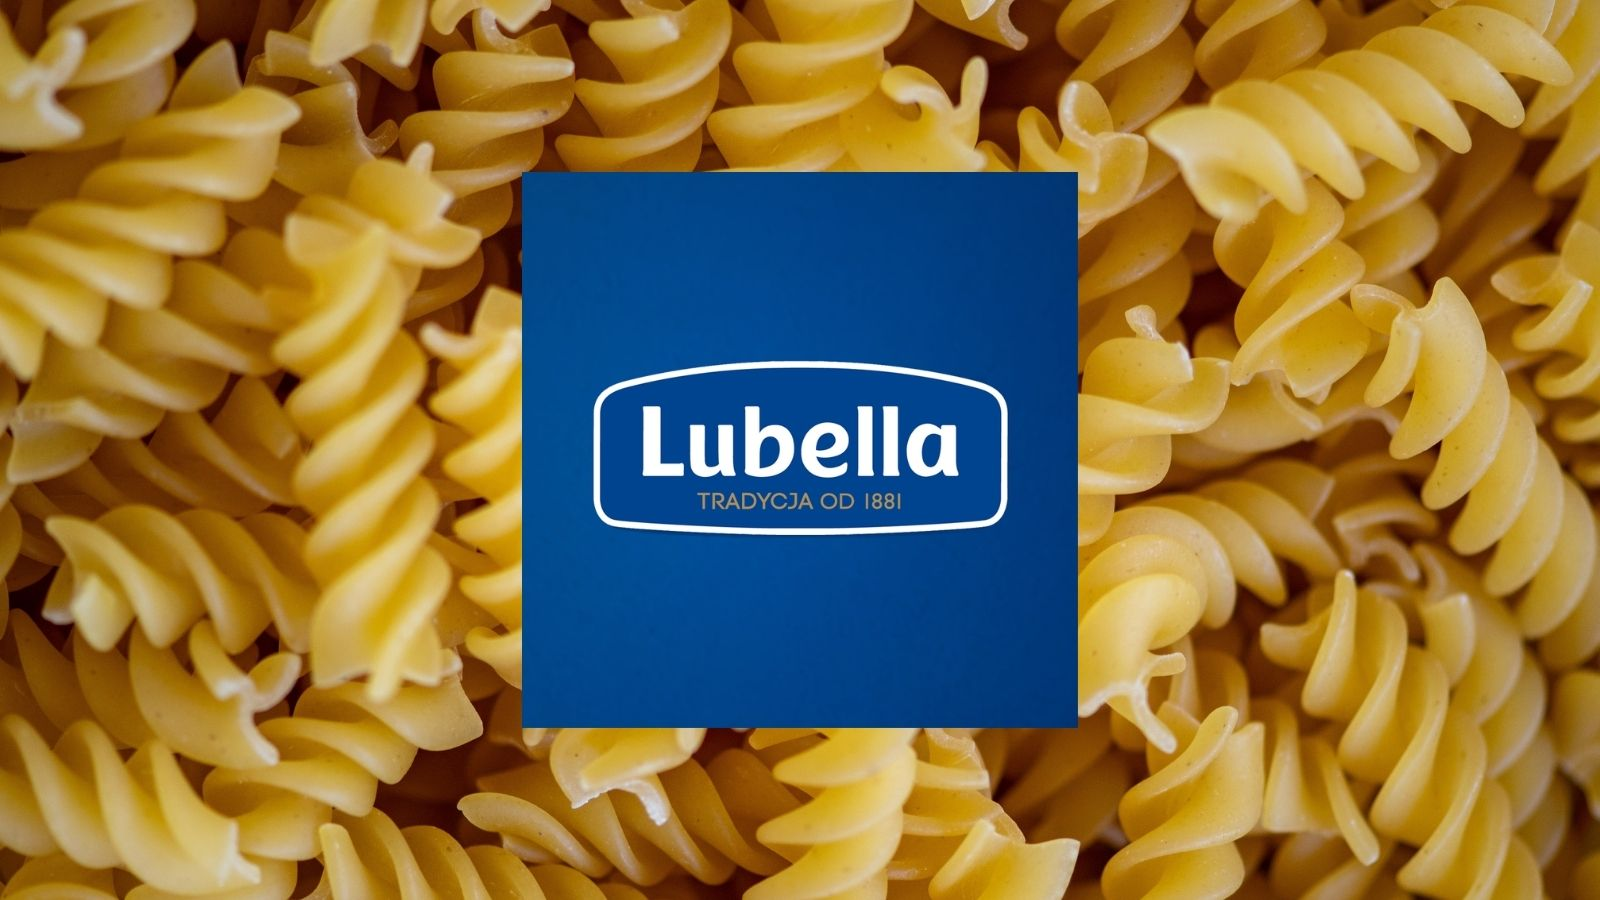 Lubella rozstrzygnęła przetarg! Przetargi mediarun lubella